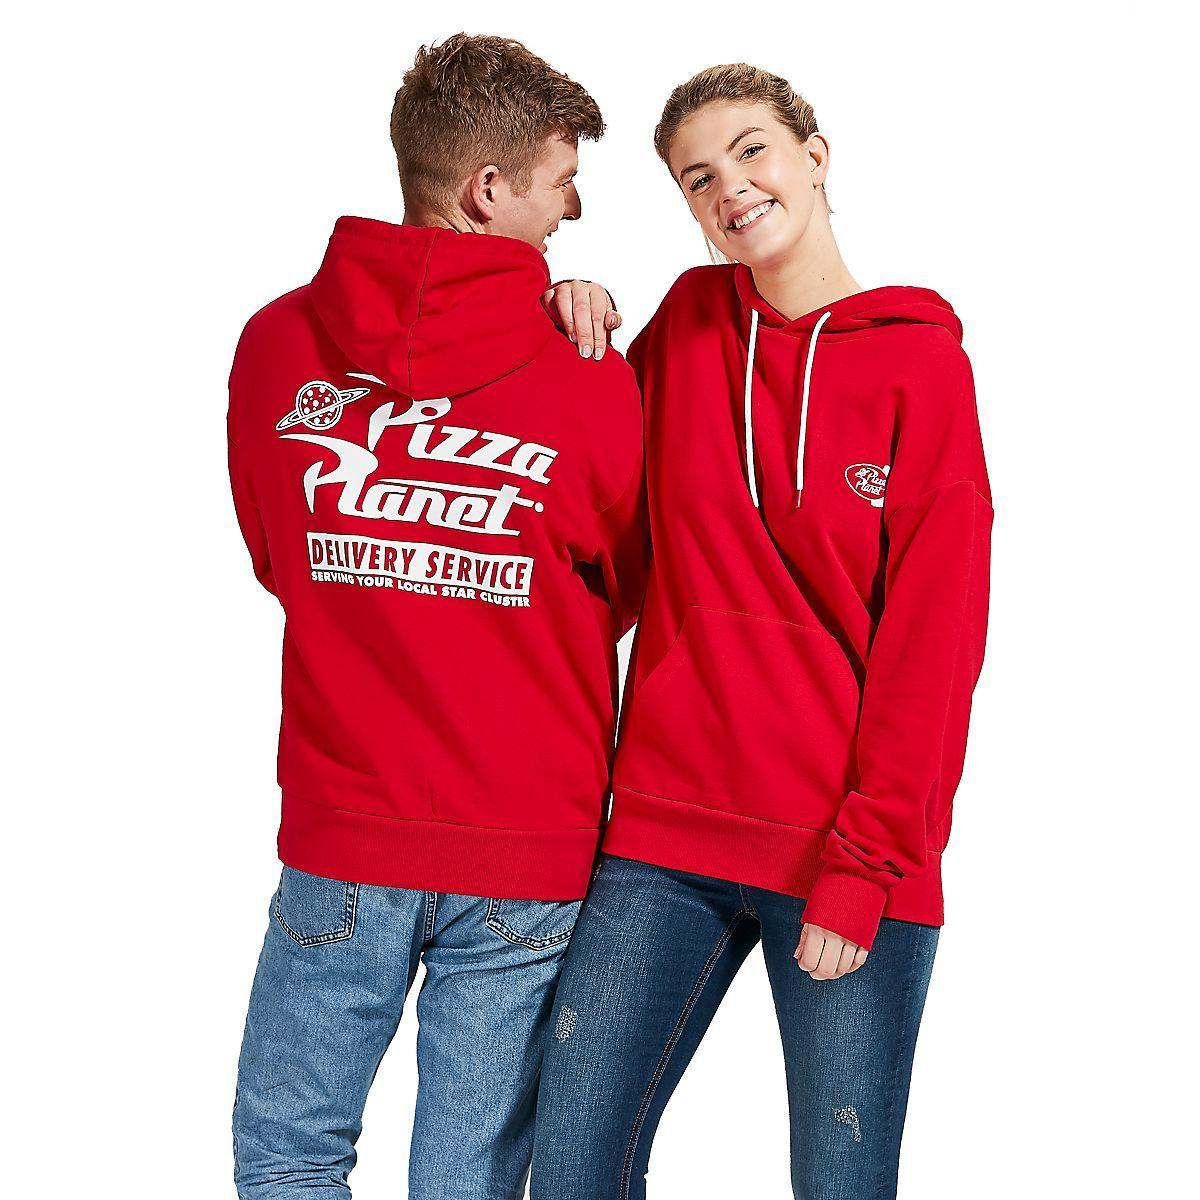 Pizza Planet logo Hoodie funny Halloween costume Sweatshirts Adult Kids size